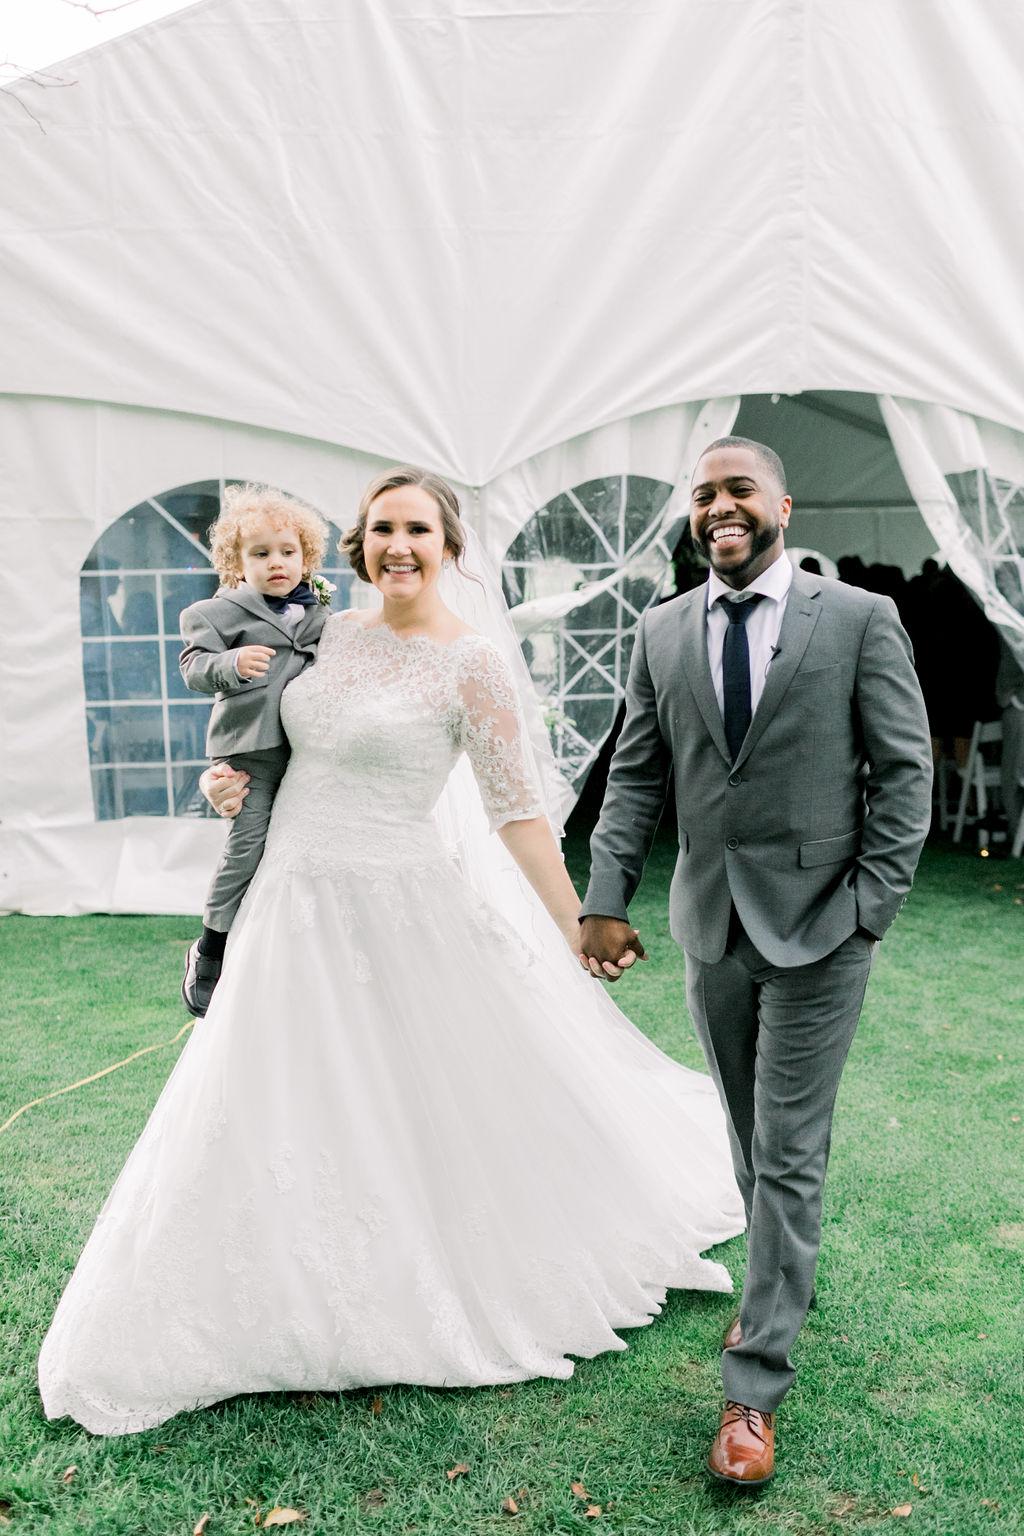 Real Tented Wedding // spunkysapphire.com/blog